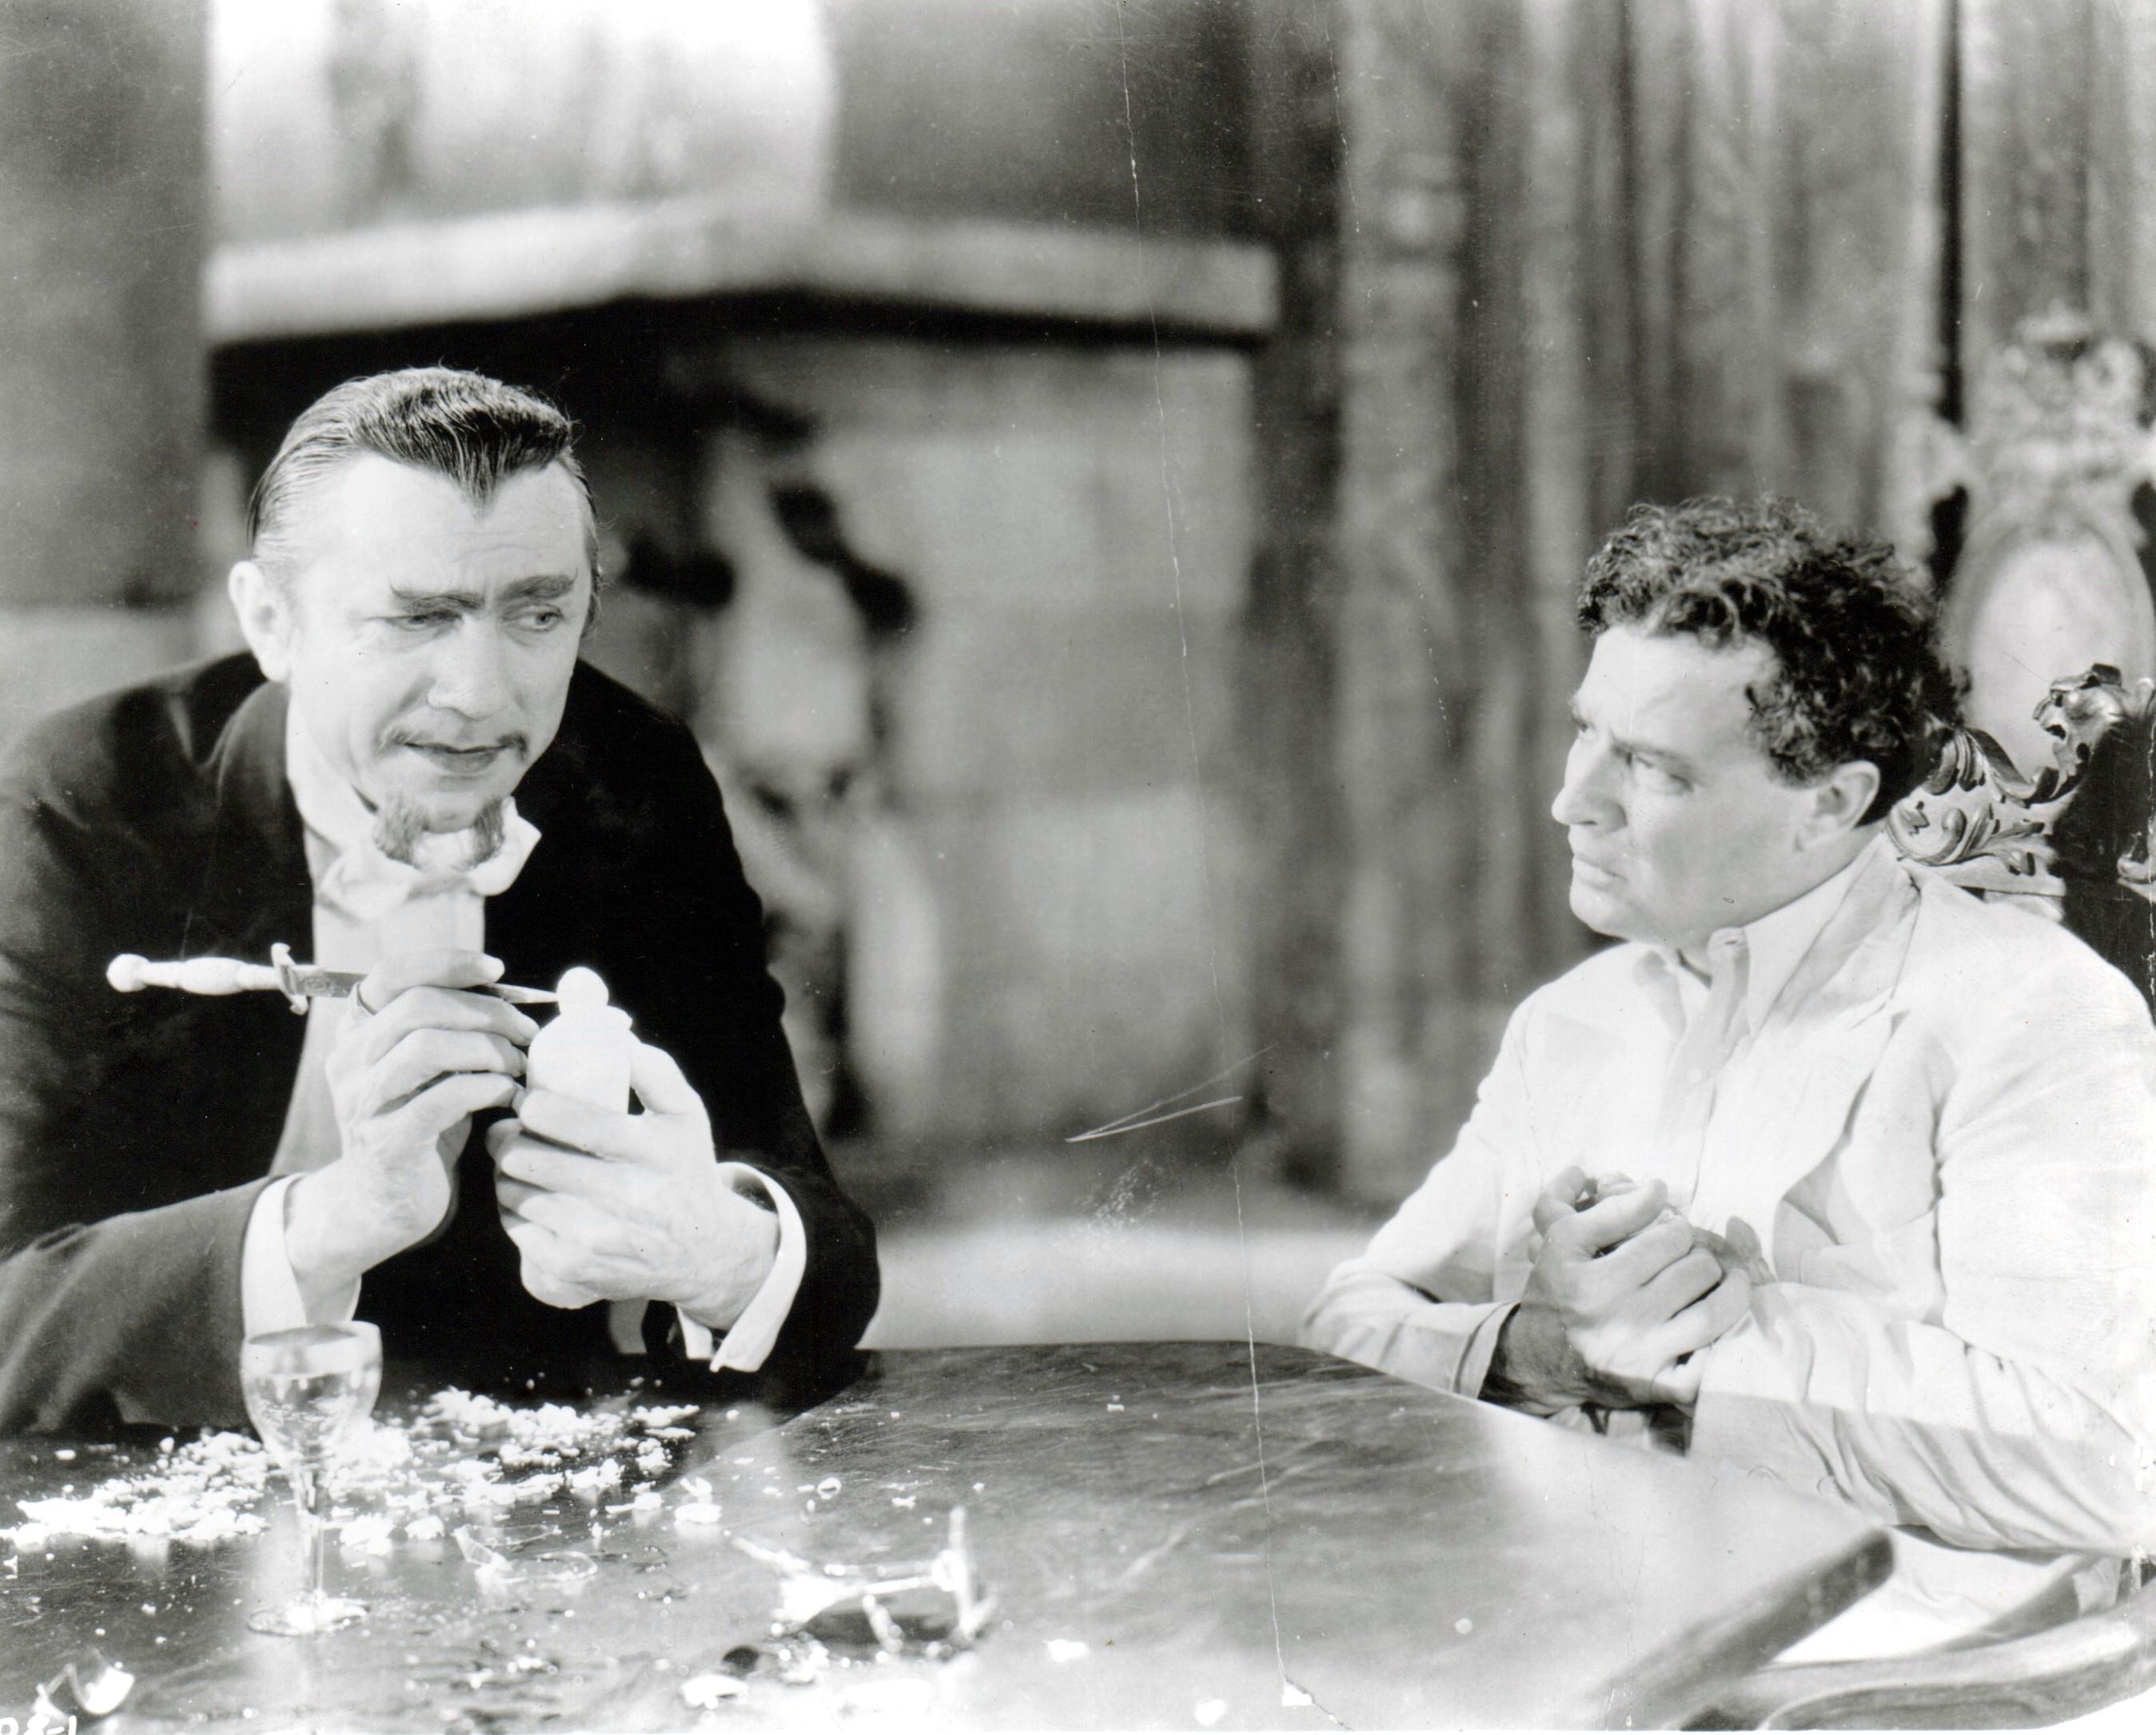 Bela Lugosi and Robert Frazer in White Zombie (1932)